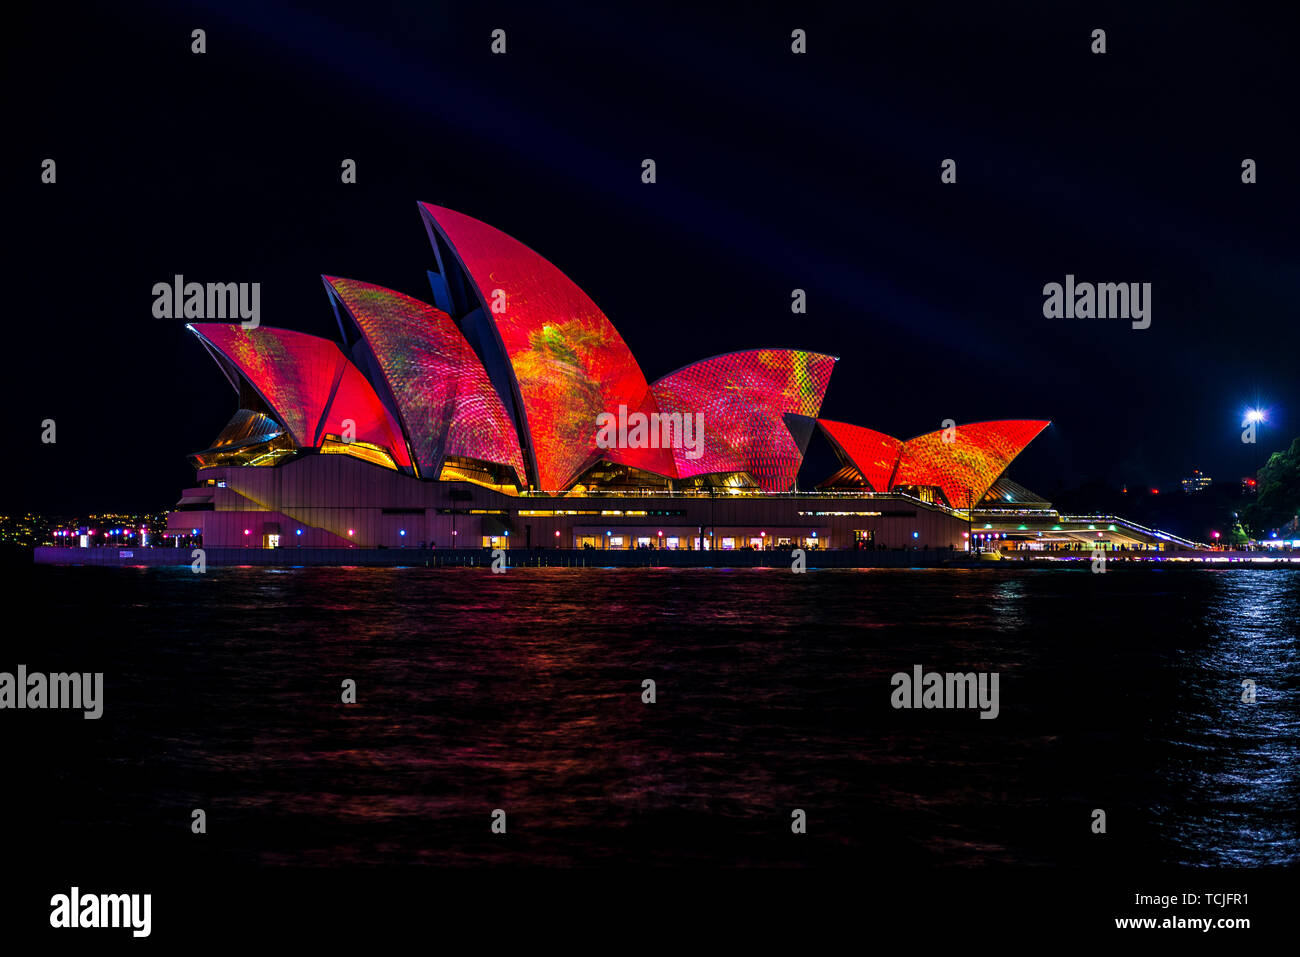 The Sydney Opera House at night during the popular light festival Vivid. Sydney, Australia. Stock Photo